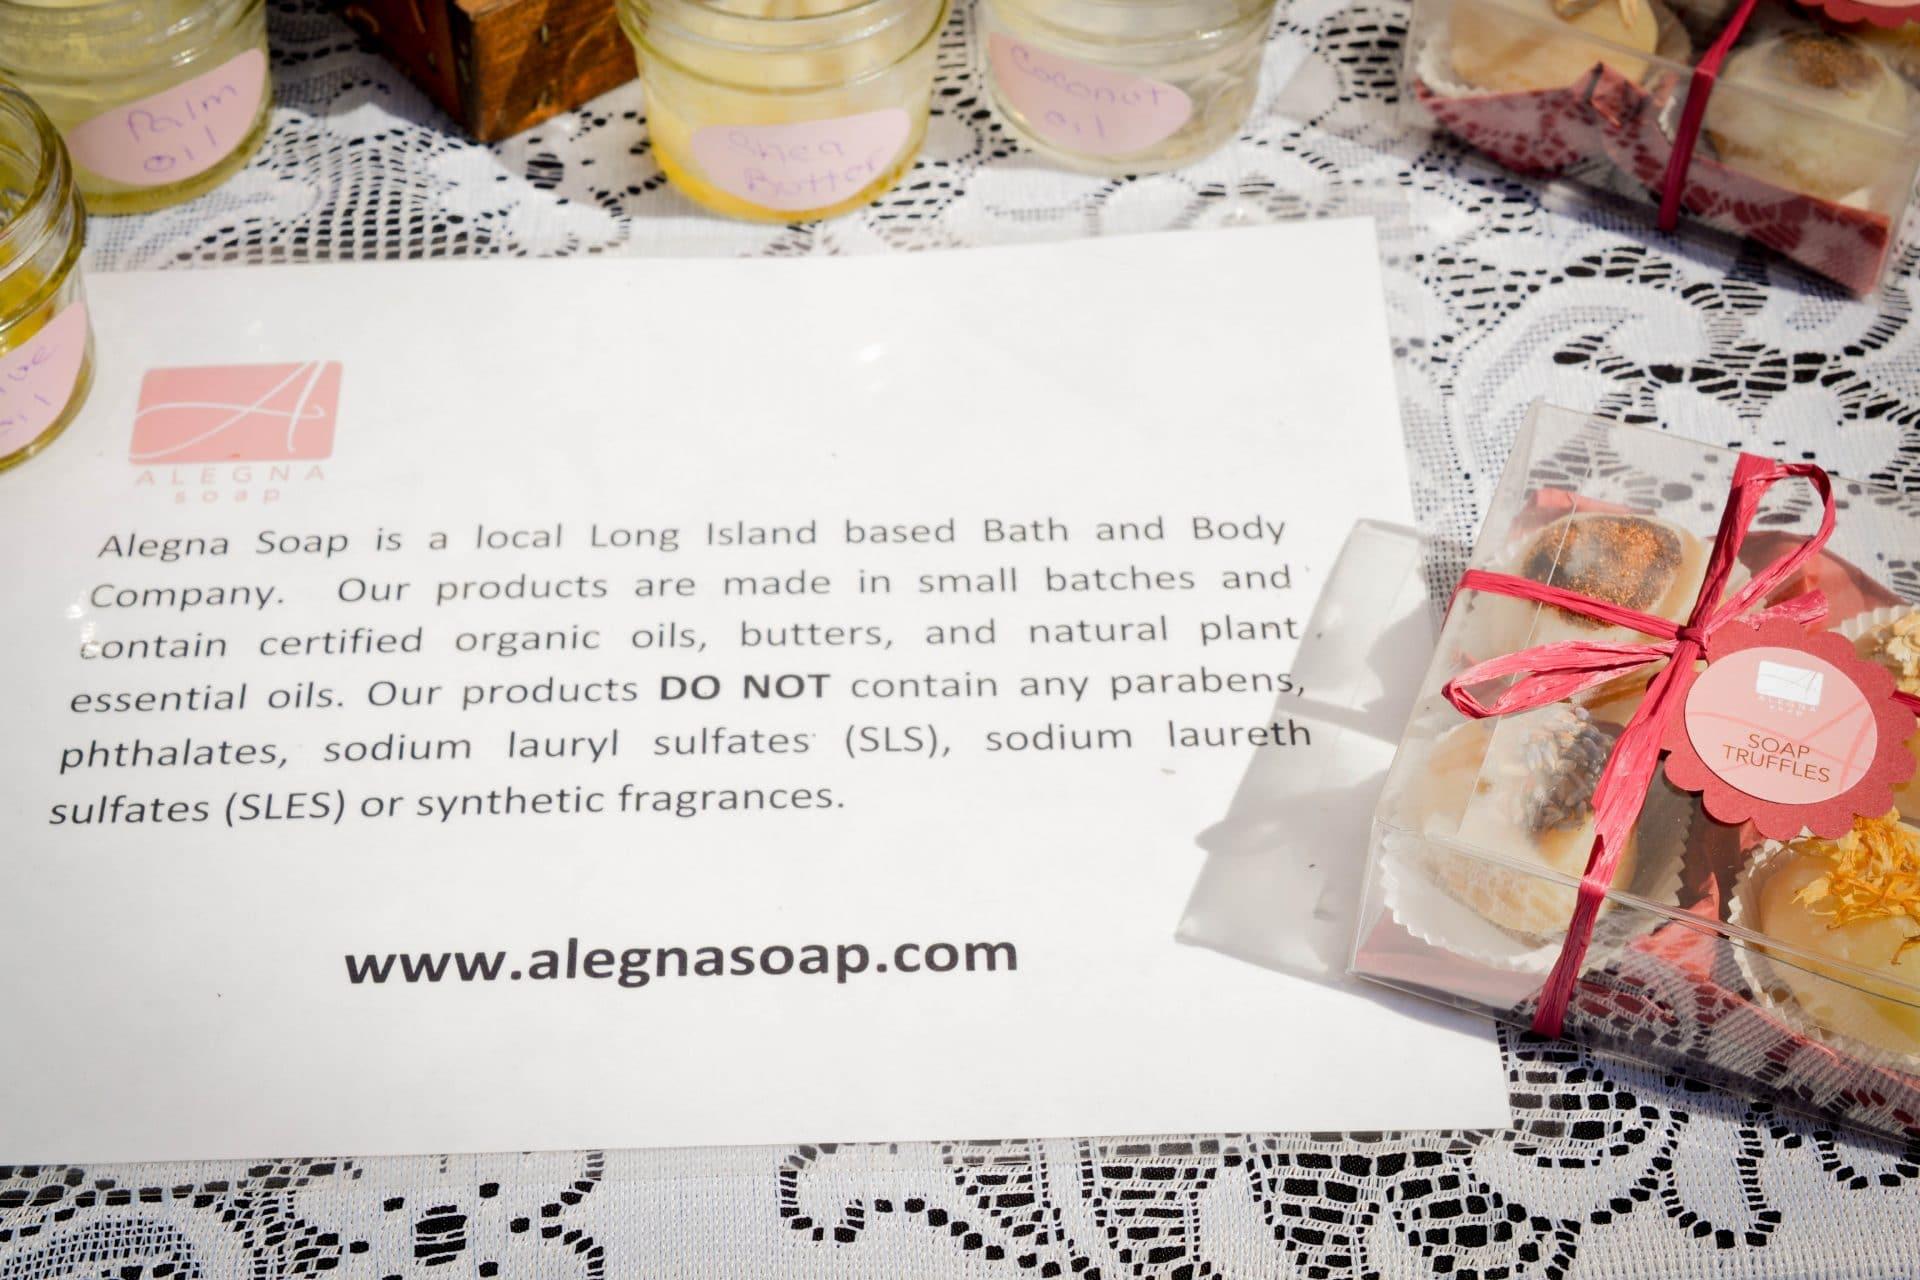 Alegna Soap® Long Island Soap Company how to choose a handcrafted soap